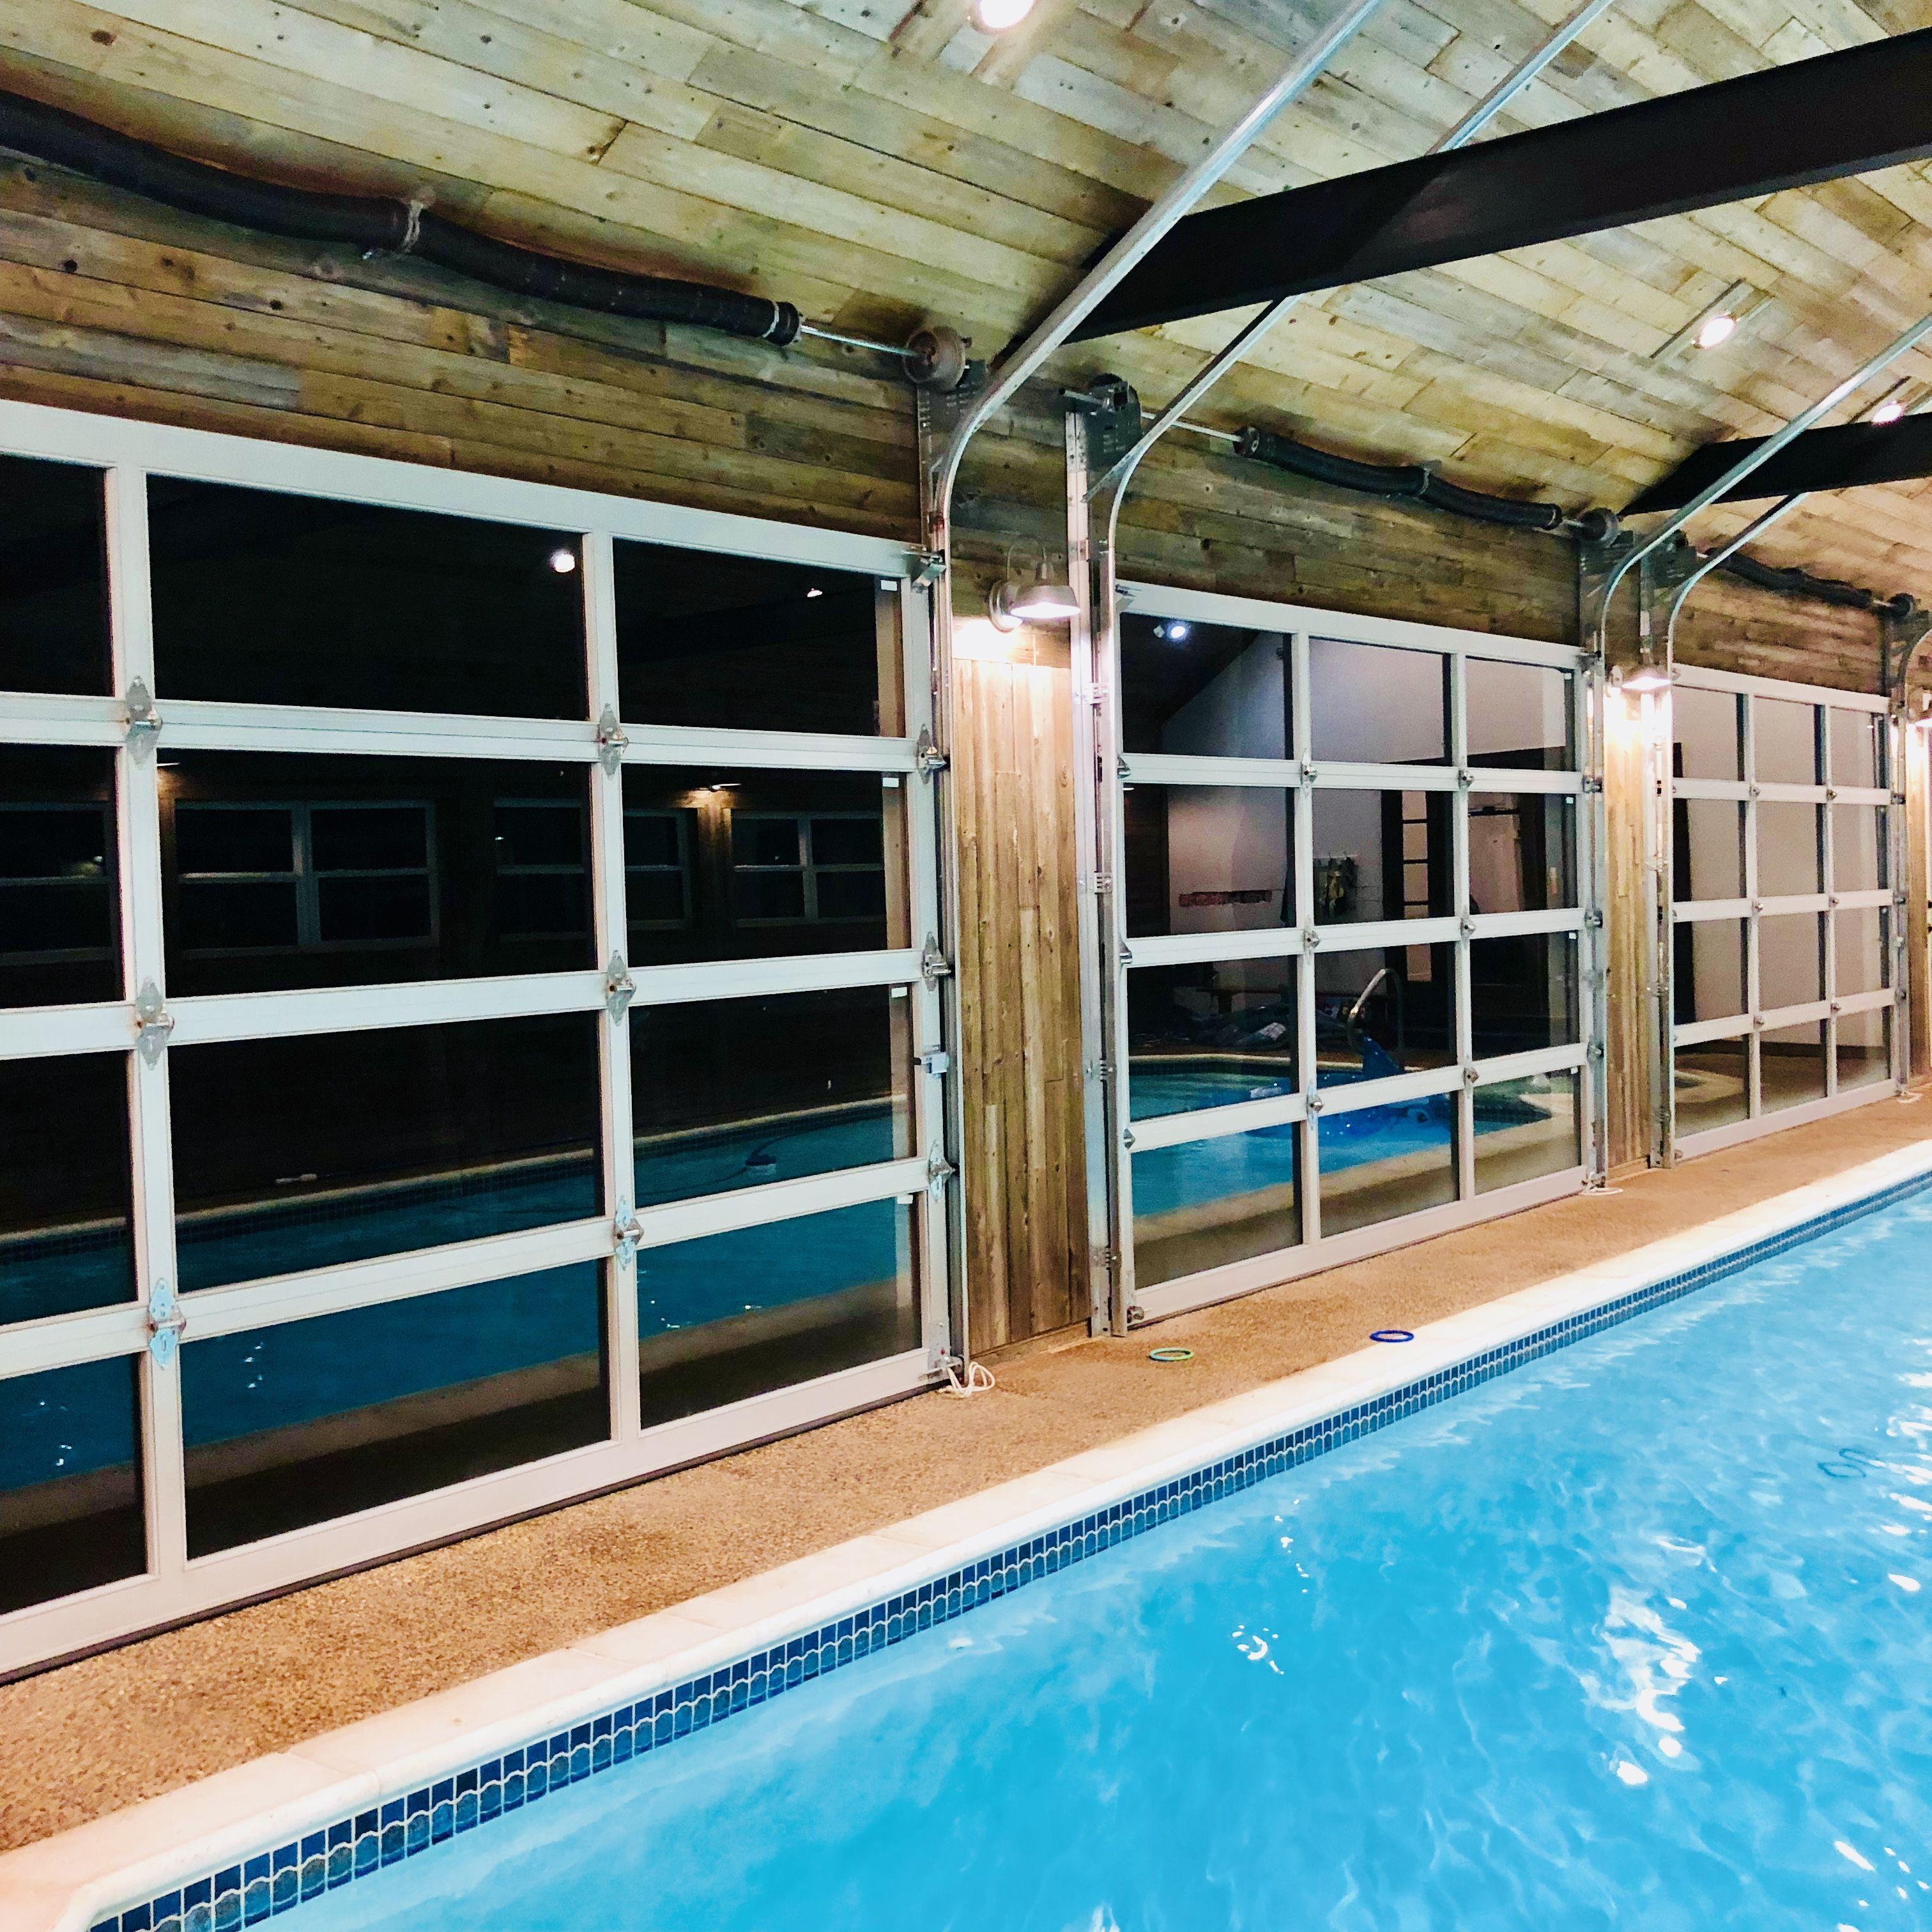 Indoor pool with glass garage doors | Pool in 2019 | Small ...